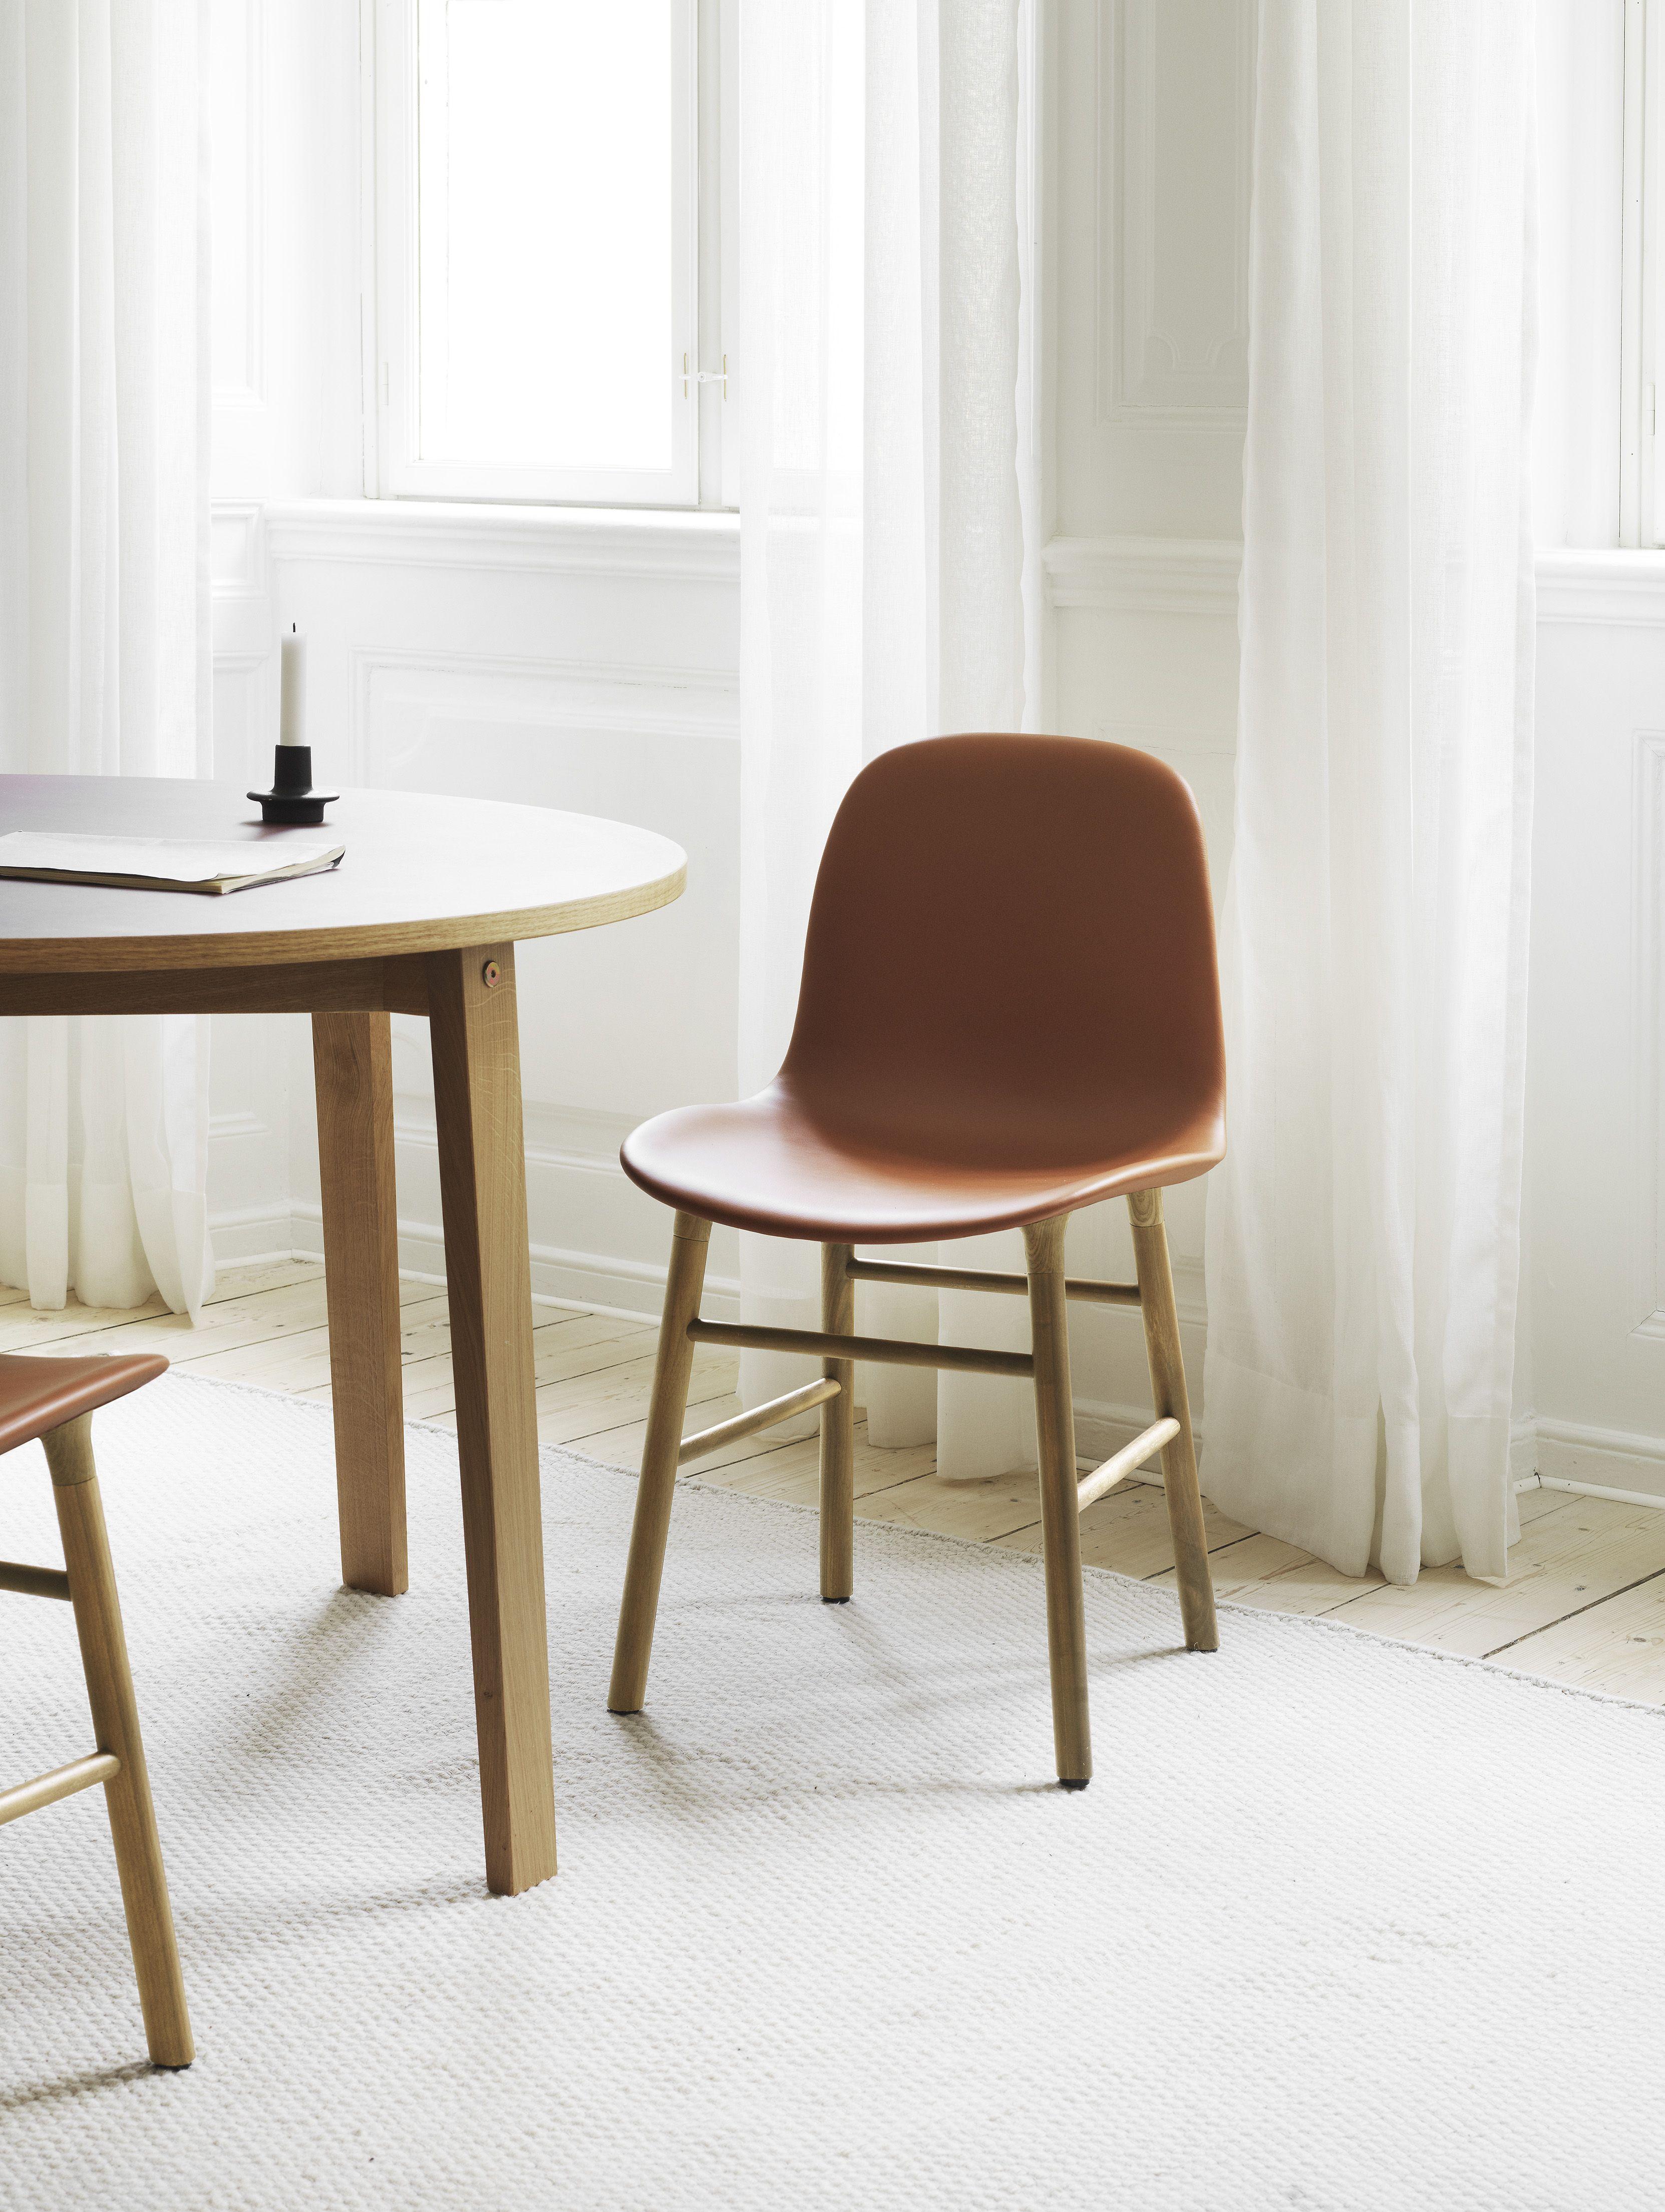 Form Chair In 2020 Scandinavian Furniture Design Furniture Design House Interior